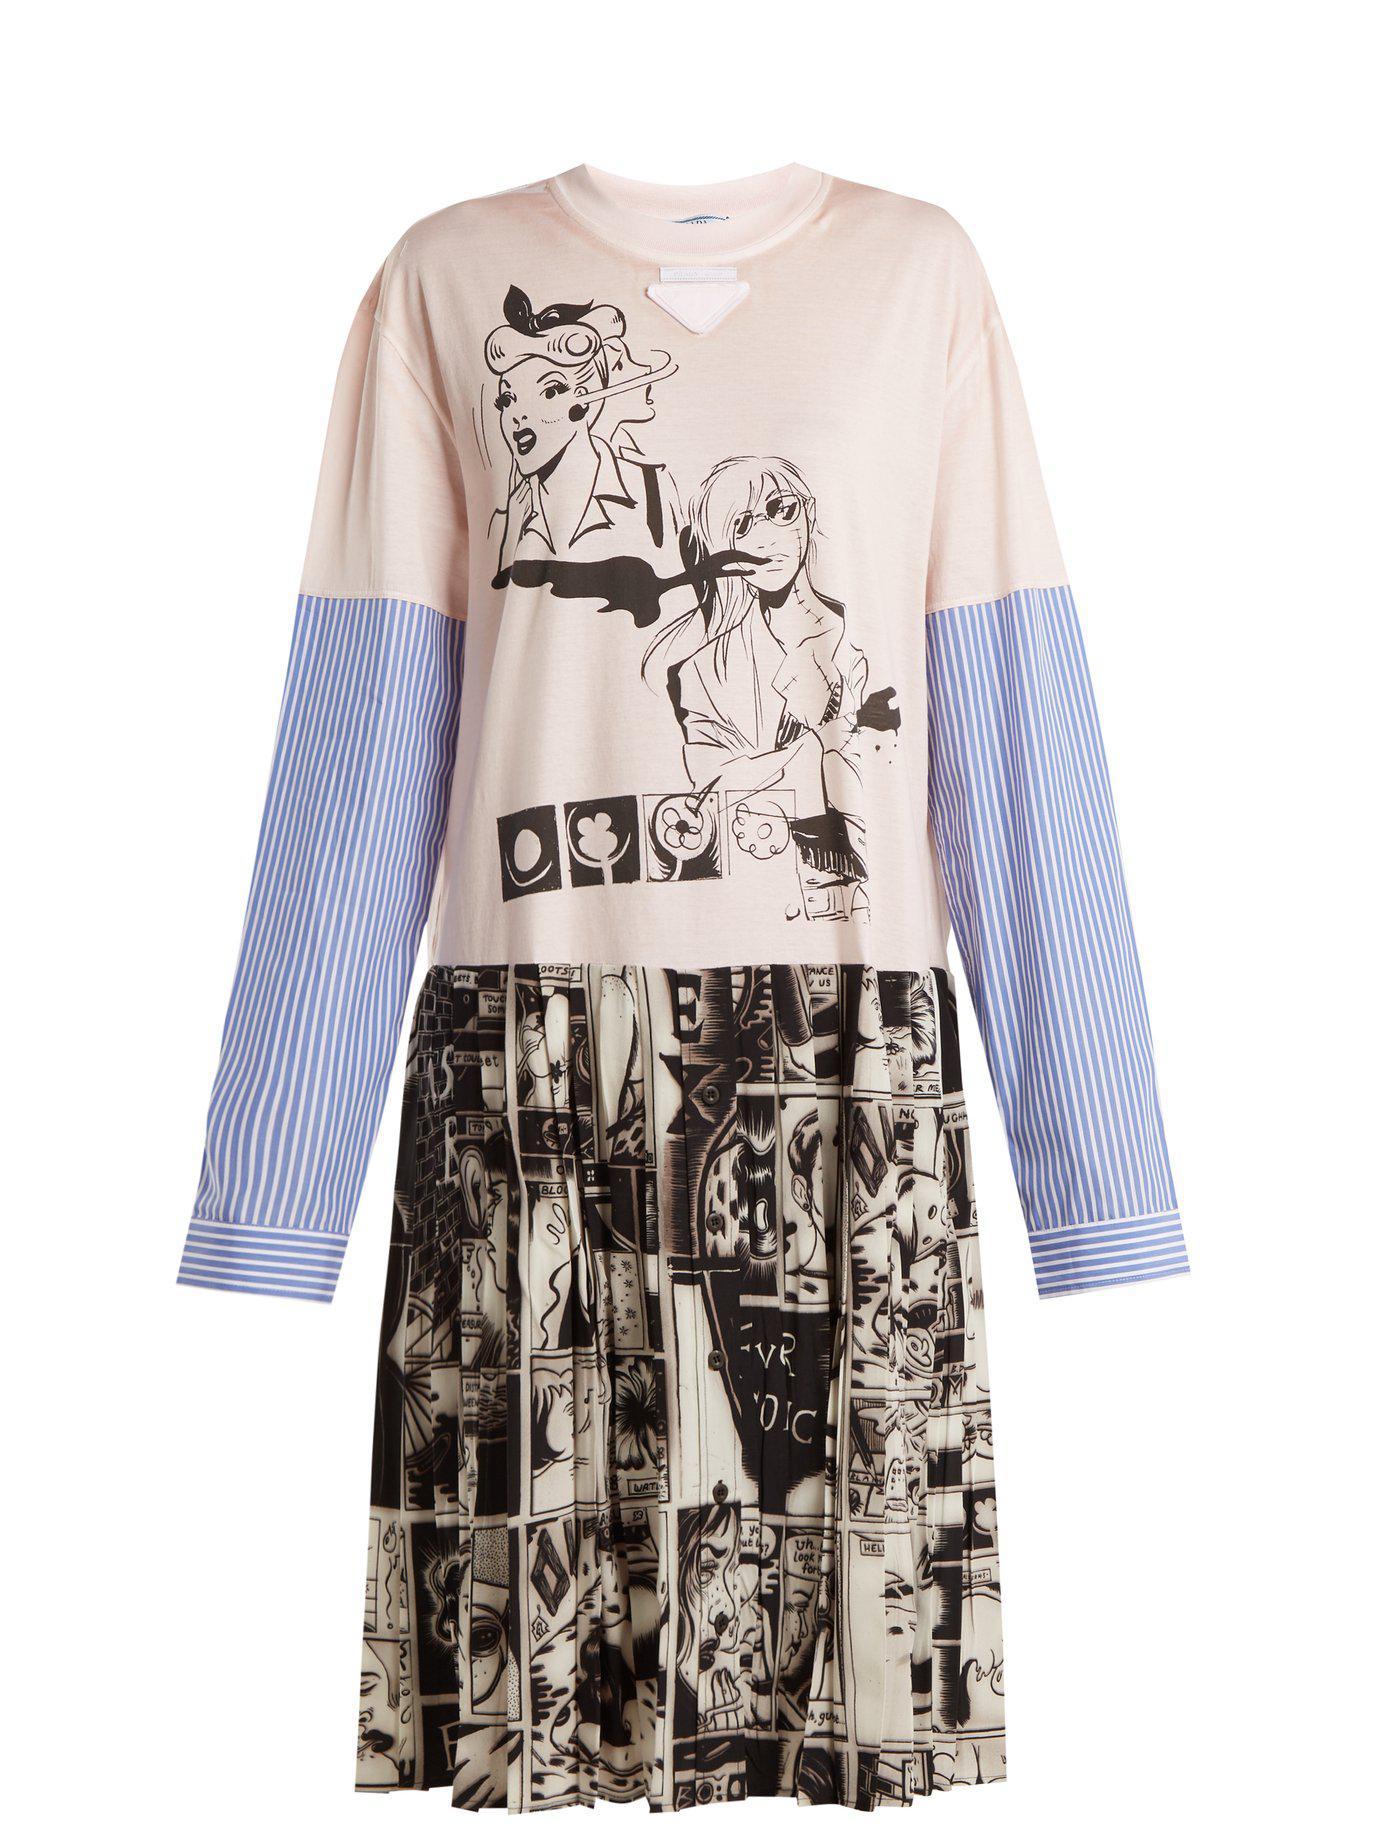 54ec6f76eb Lyst - Prada Comic Print Cotton Jersey And Silk Dress